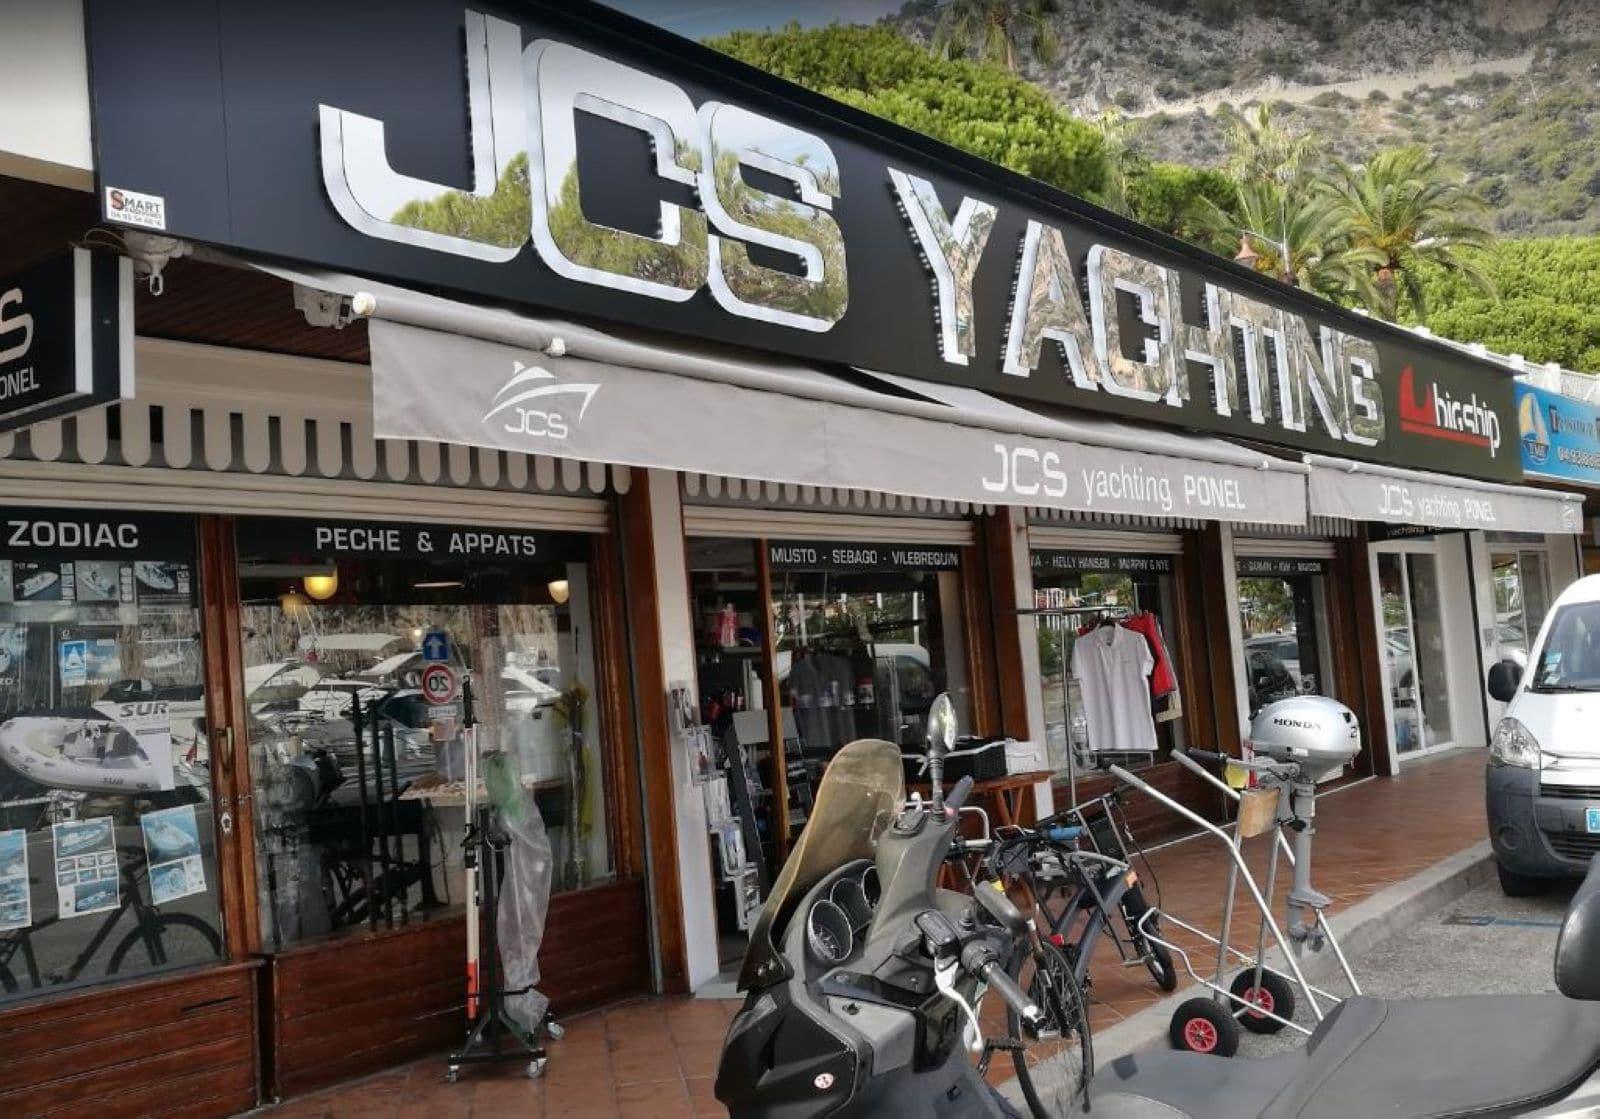 enseigne-metal-yachting-beaulieu-jcs-yachting